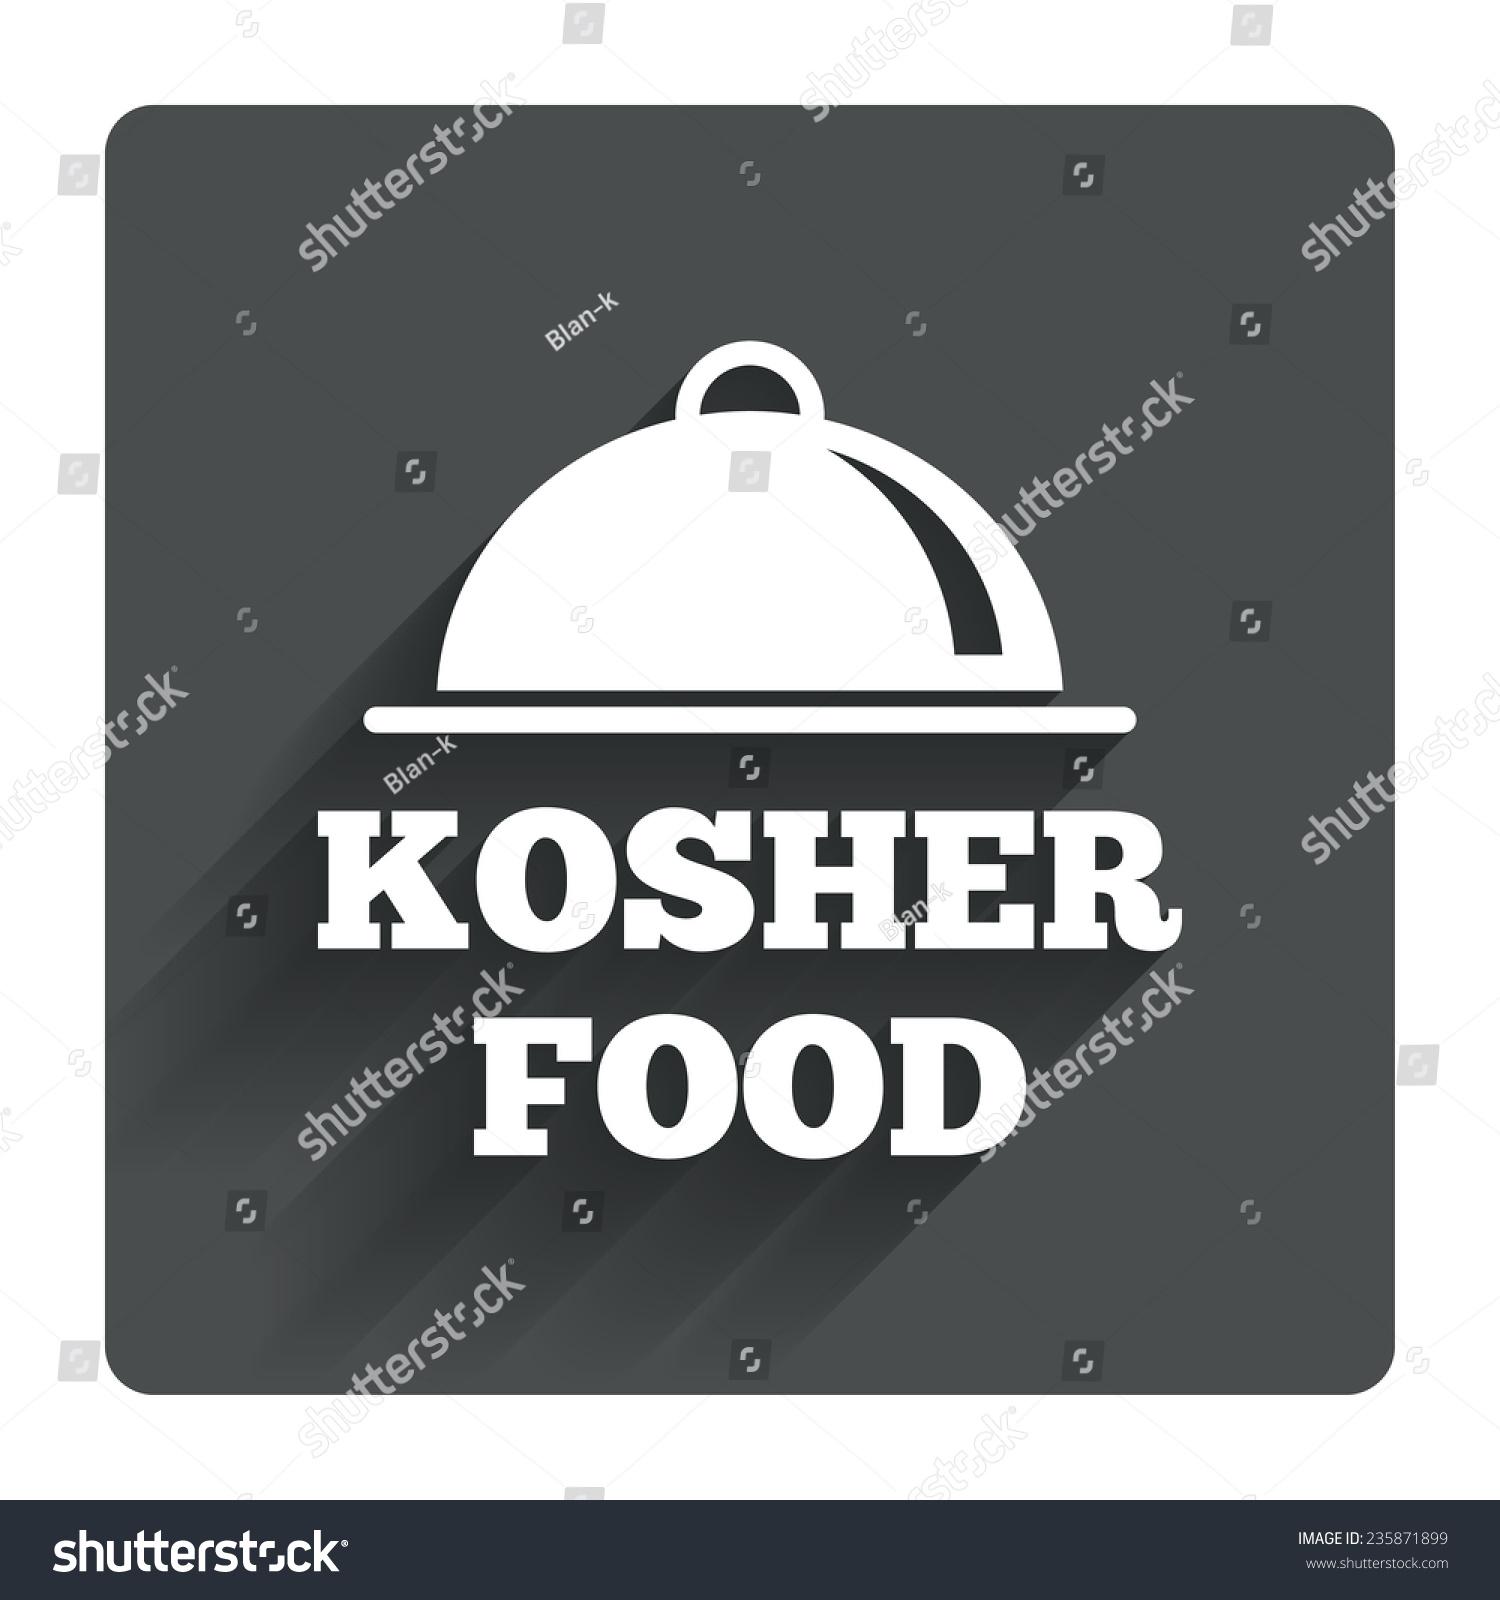 Jewish kosher symbols image collections symbol and sign ideas crc approved kosher symbols choice image symbol and sign ideas circle k kosher symbol gallery symbol biocorpaavc